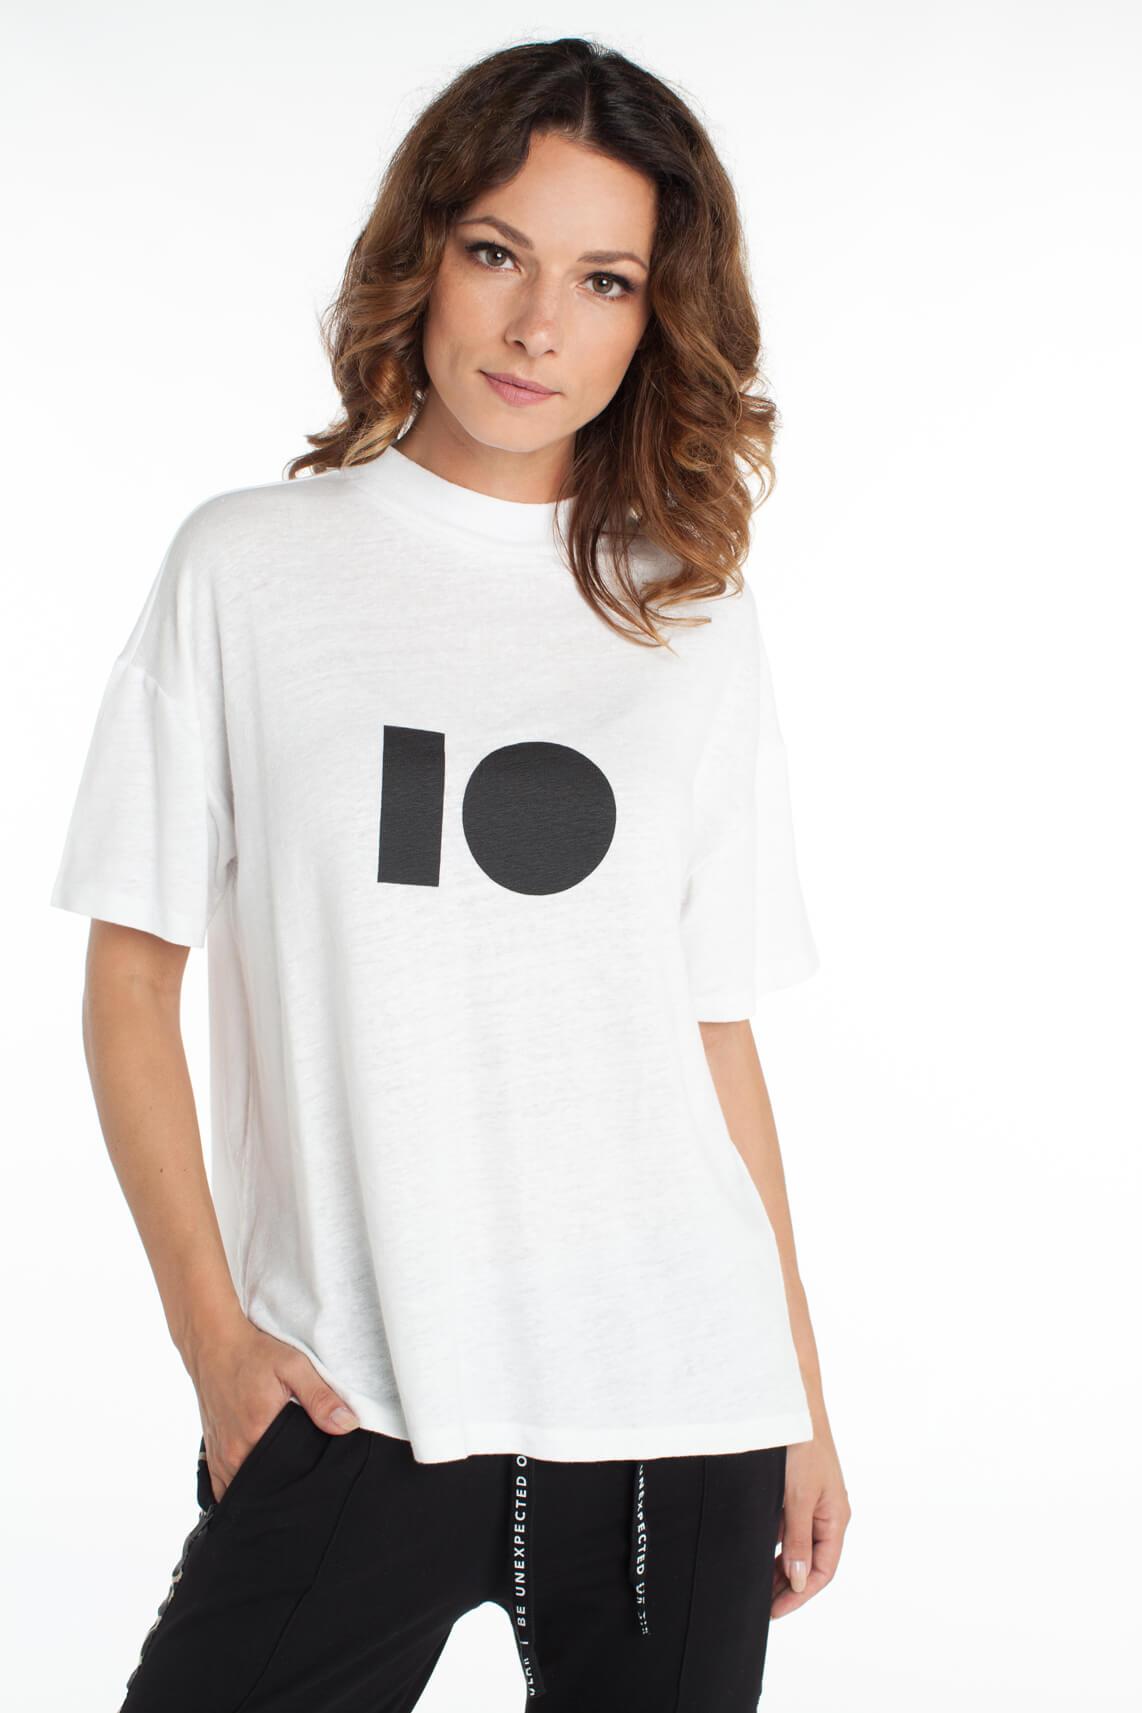 Dames Tshirt 10Days Turtle Neck Linen Tee